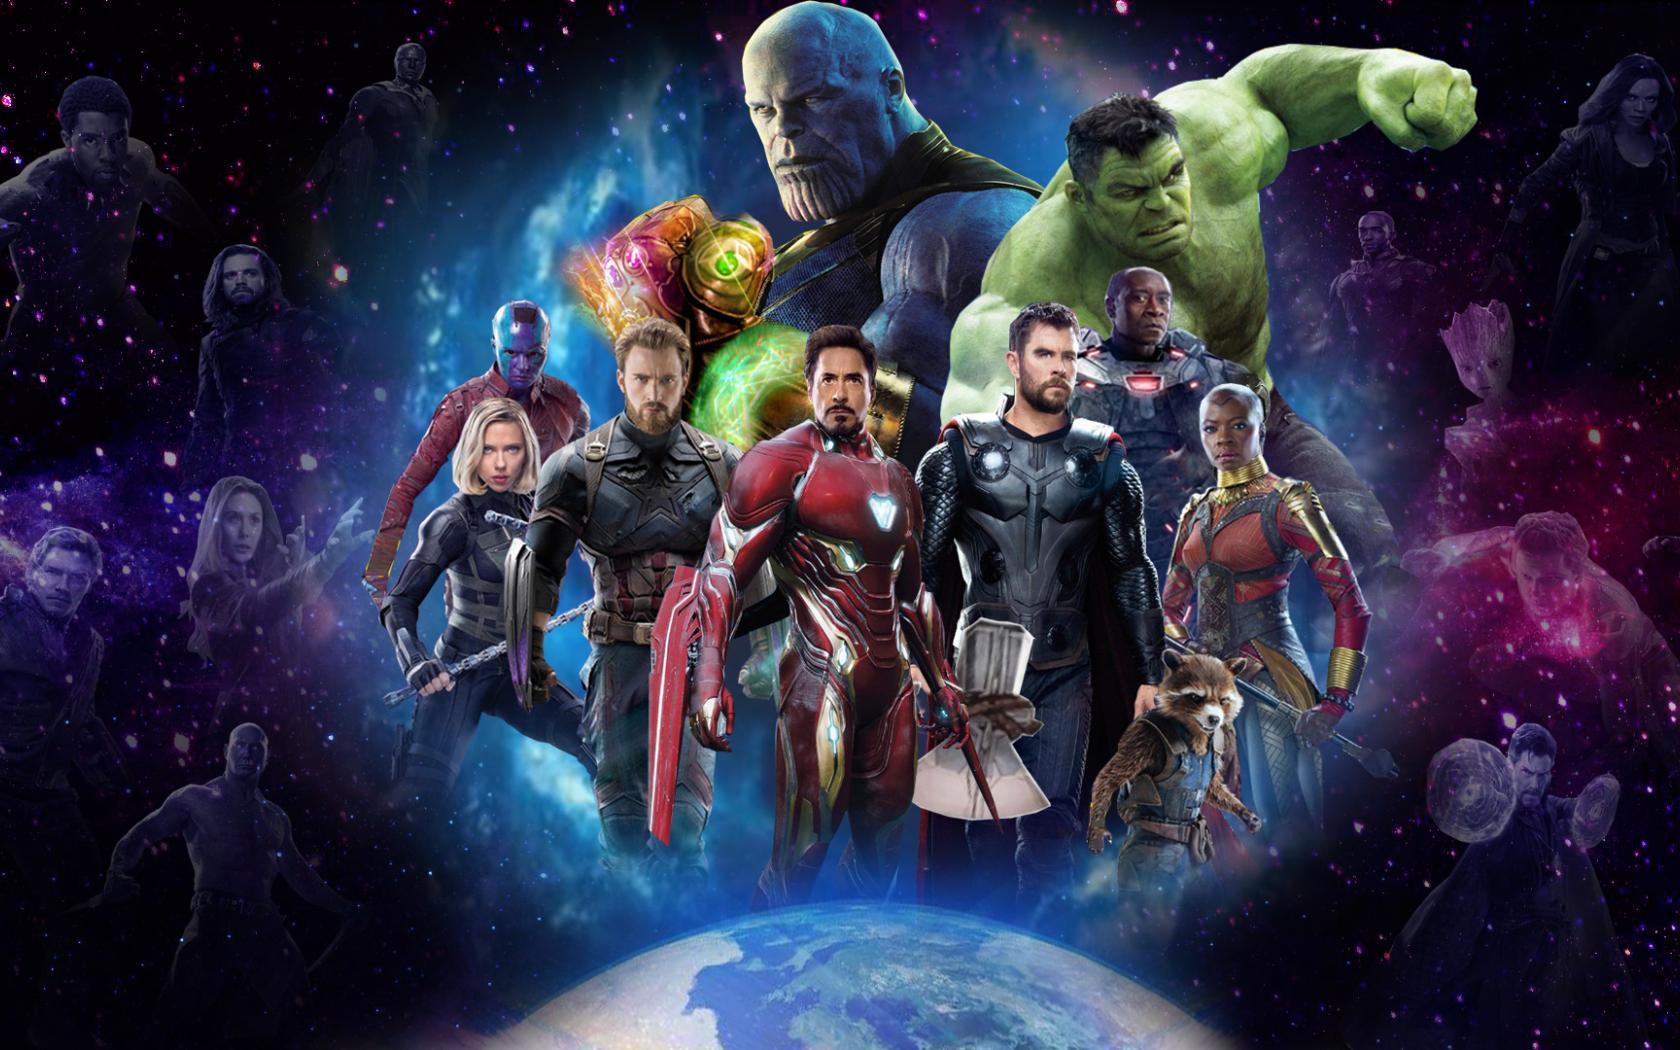 10 New Avengers Infinity War Desktop Wallpaper Full Hd: Download Avengers 4 Artwork From Infinity War 1080x1920